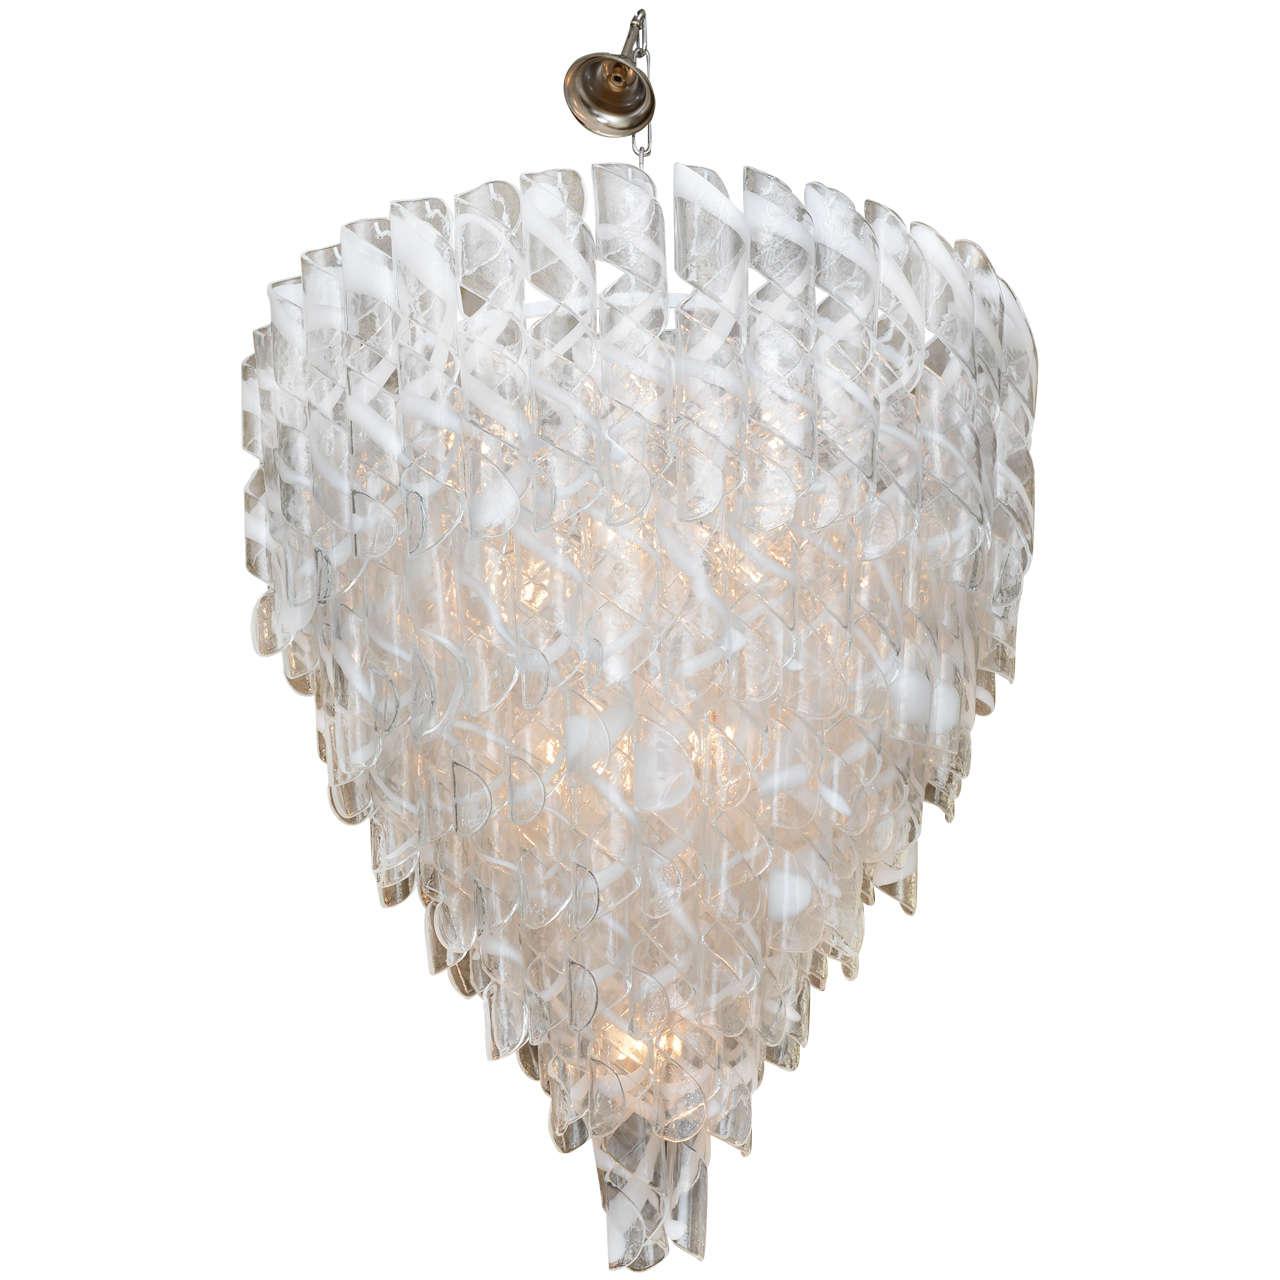 Glass Chandelier Modern: Monumental Italian Modern Glass Chandelier, Mazzega 1,Lighting